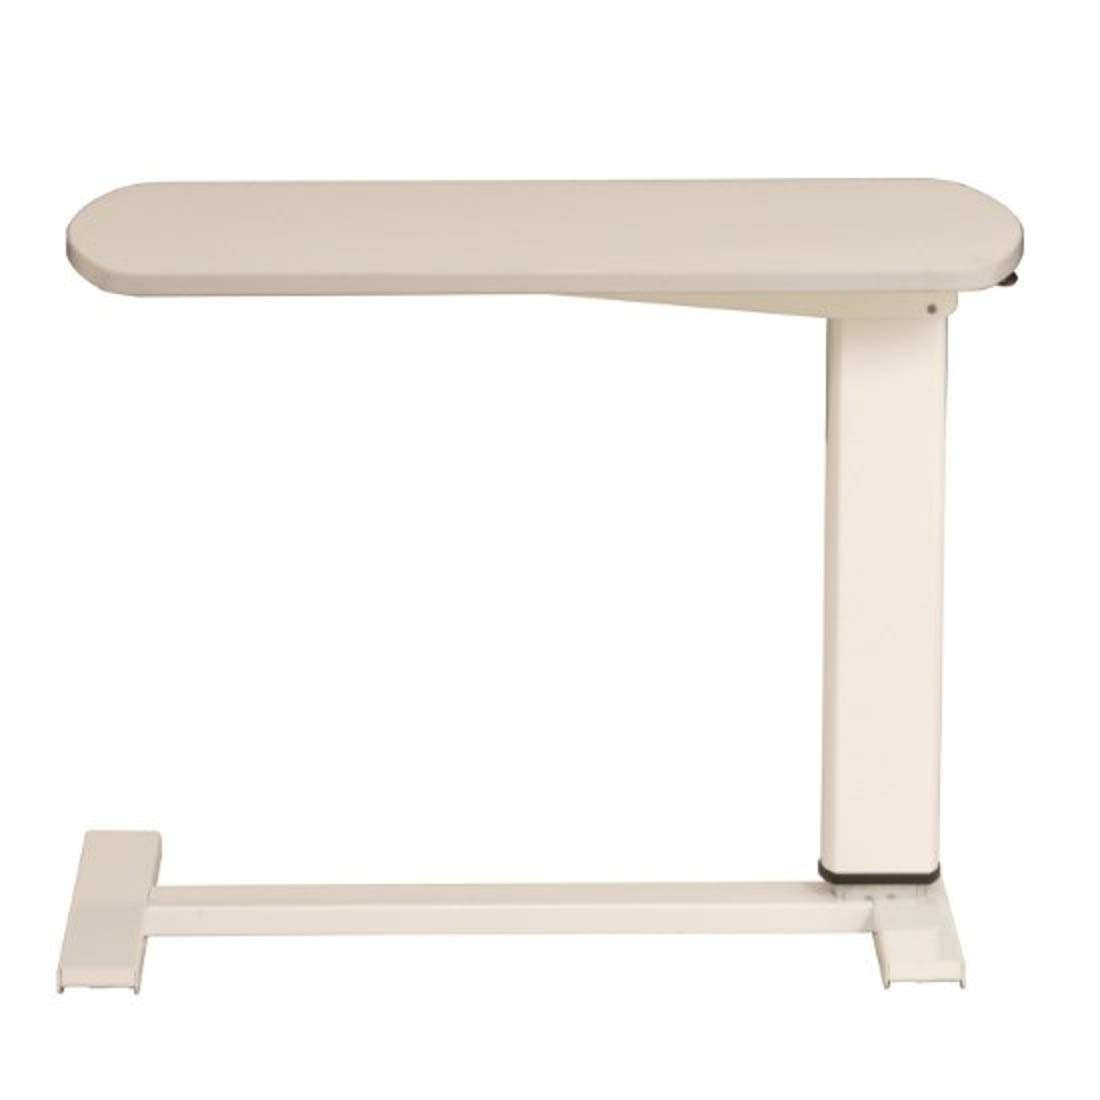 AHEART ベッドサイドテーブル 昇降 テーブル ベッド用 キャスター付き 医療 介護 施設 SI 526 ホワイト B07GXPSDHZ  ホワイト